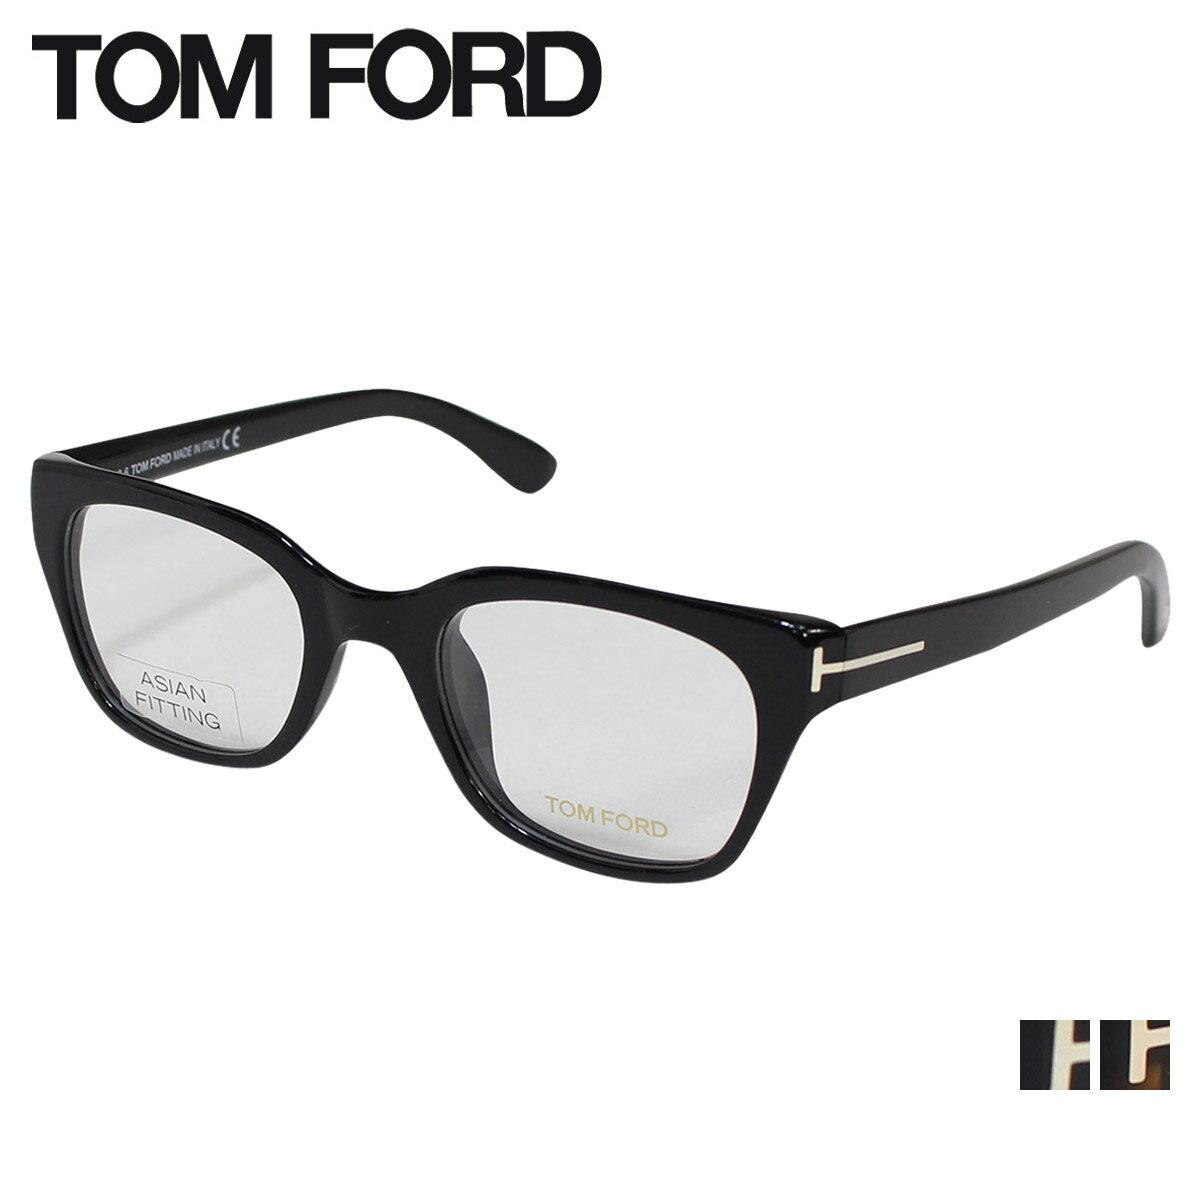 TOM FORD ASIAN FITTING トムフォード メガネ 眼鏡 メンズ レディース アイウェア FT4240 イタリア製 【決算セール】